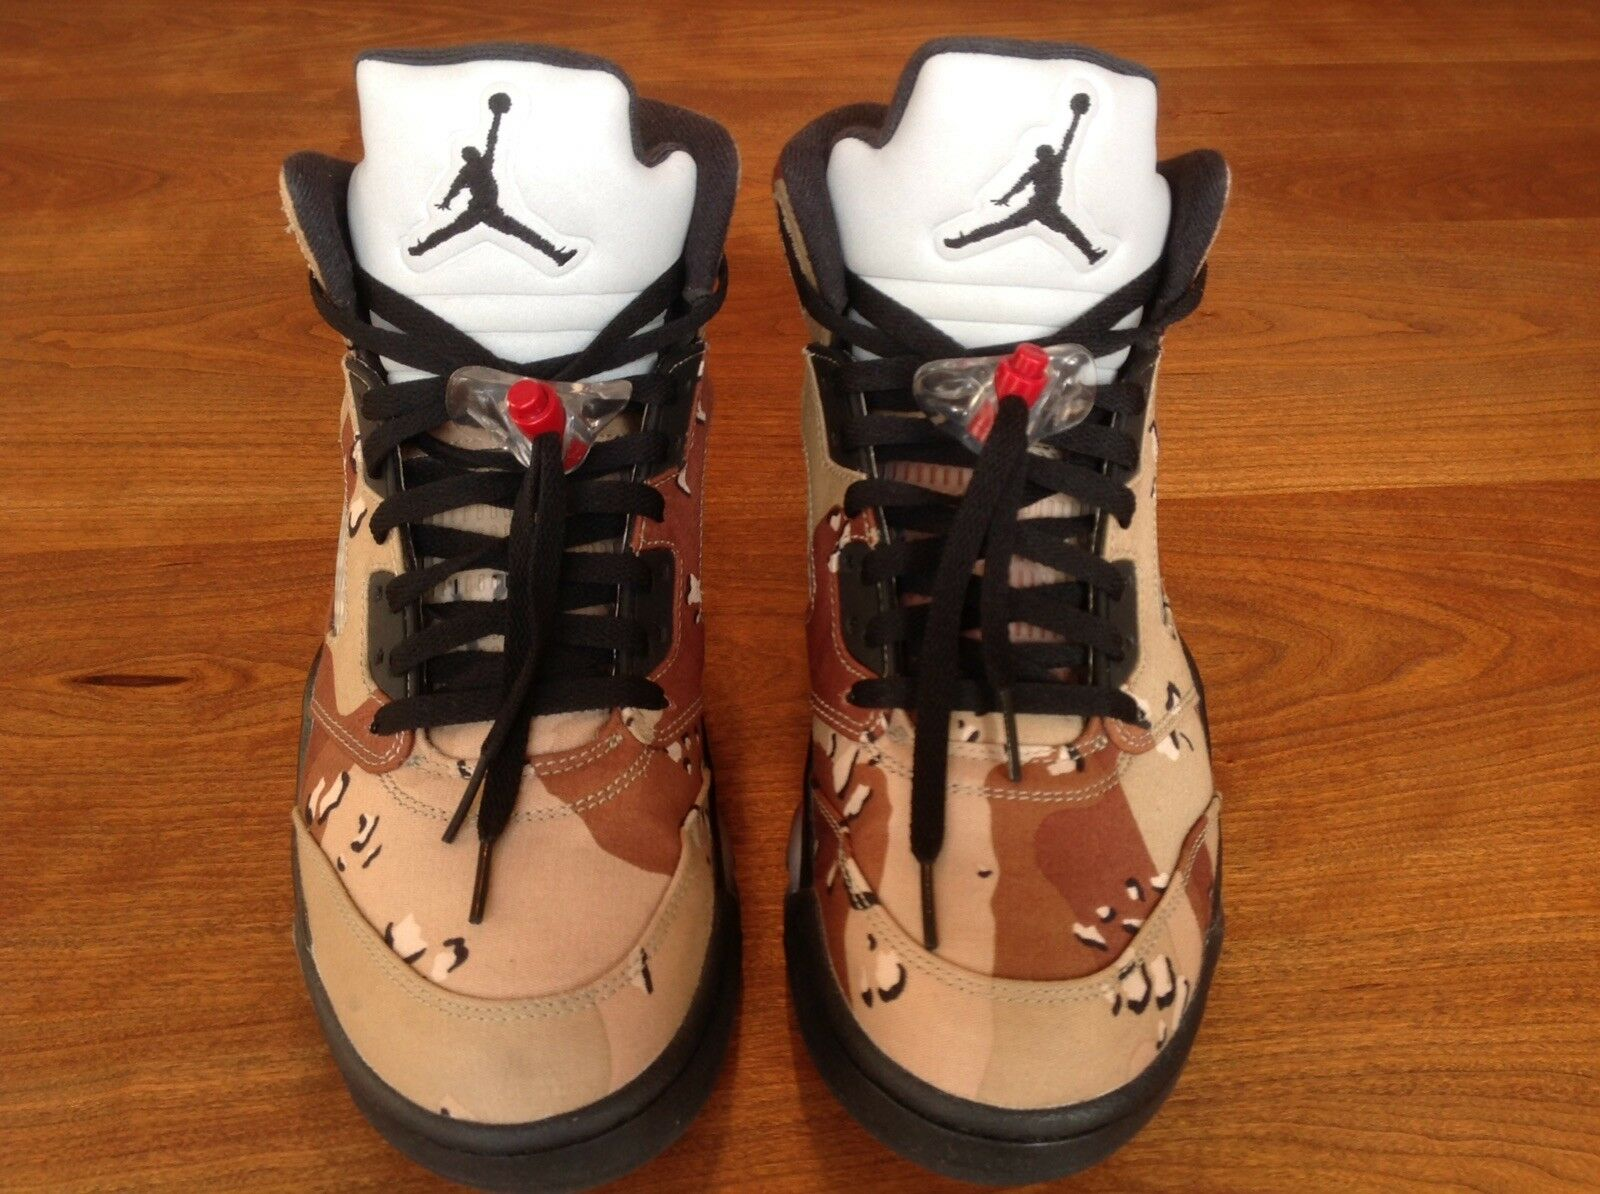 c74c8291bb731 Air 5 V Retro Supreme Camo Men s 11 Nike Jordan nvmgyu2828-Athletic Shoes -  fishing.xlri-xlerate.com